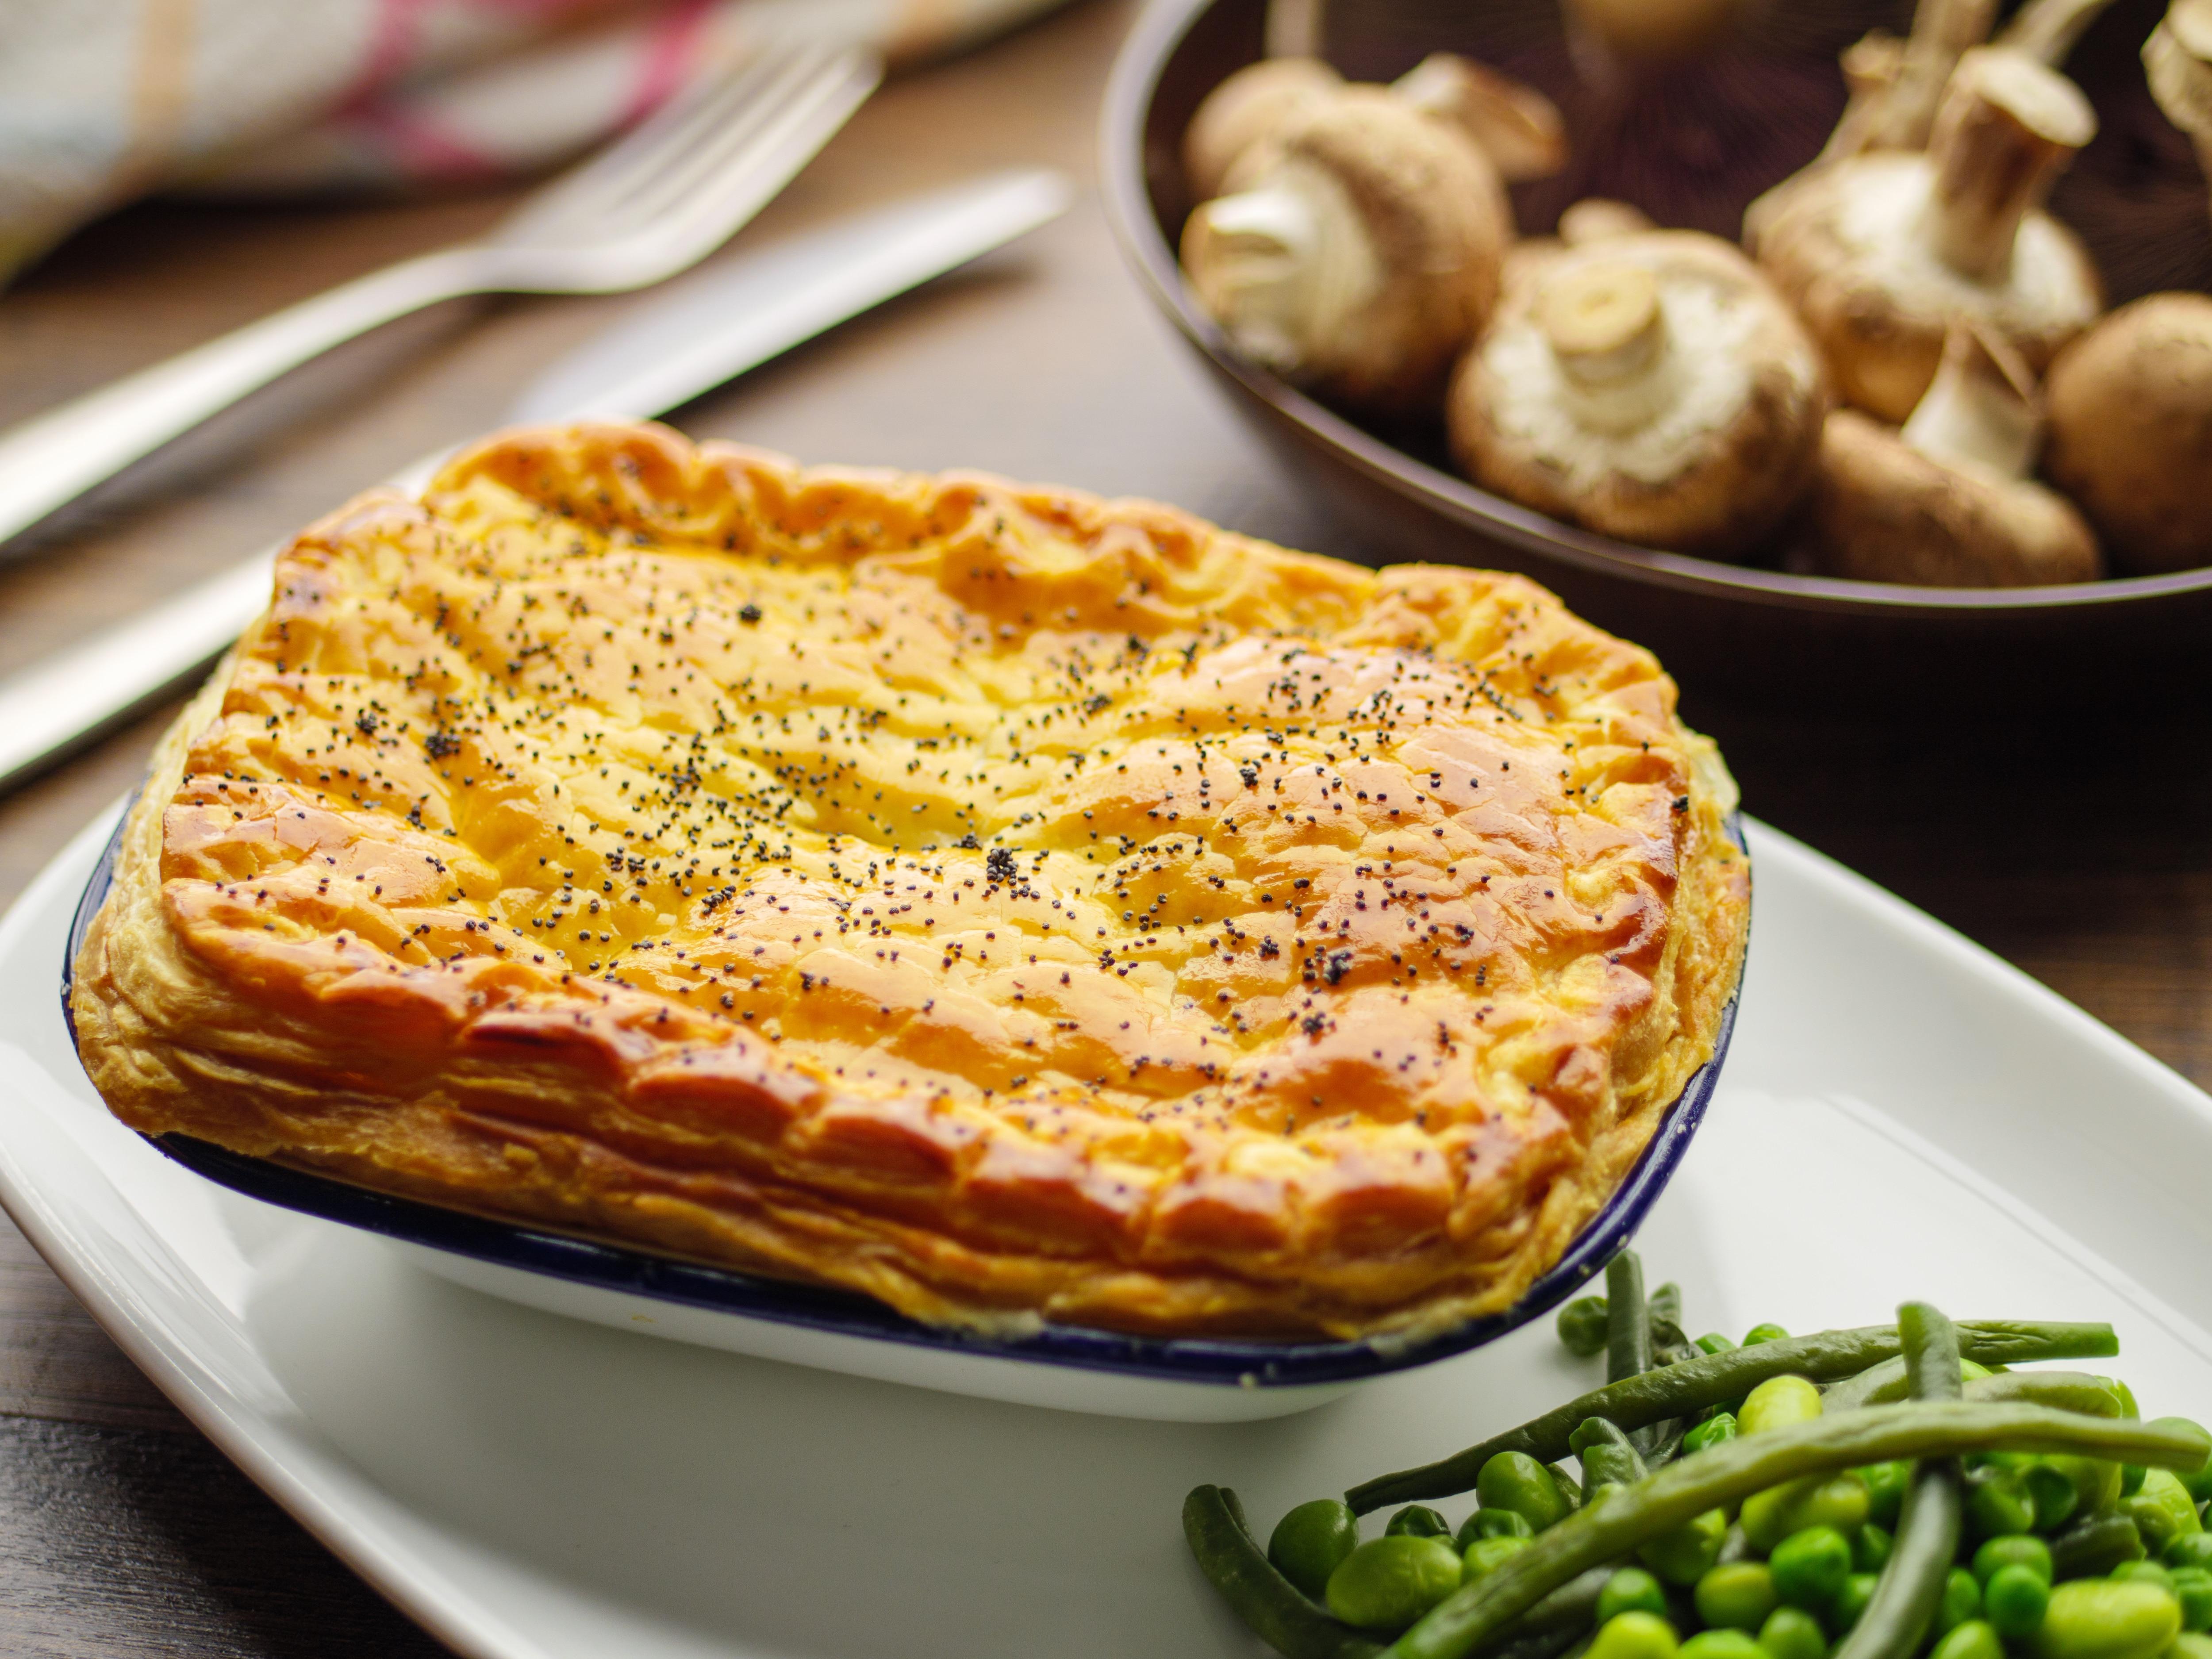 Jo Pratt's Creamy Mushroom, Leek & Chestnut Pie